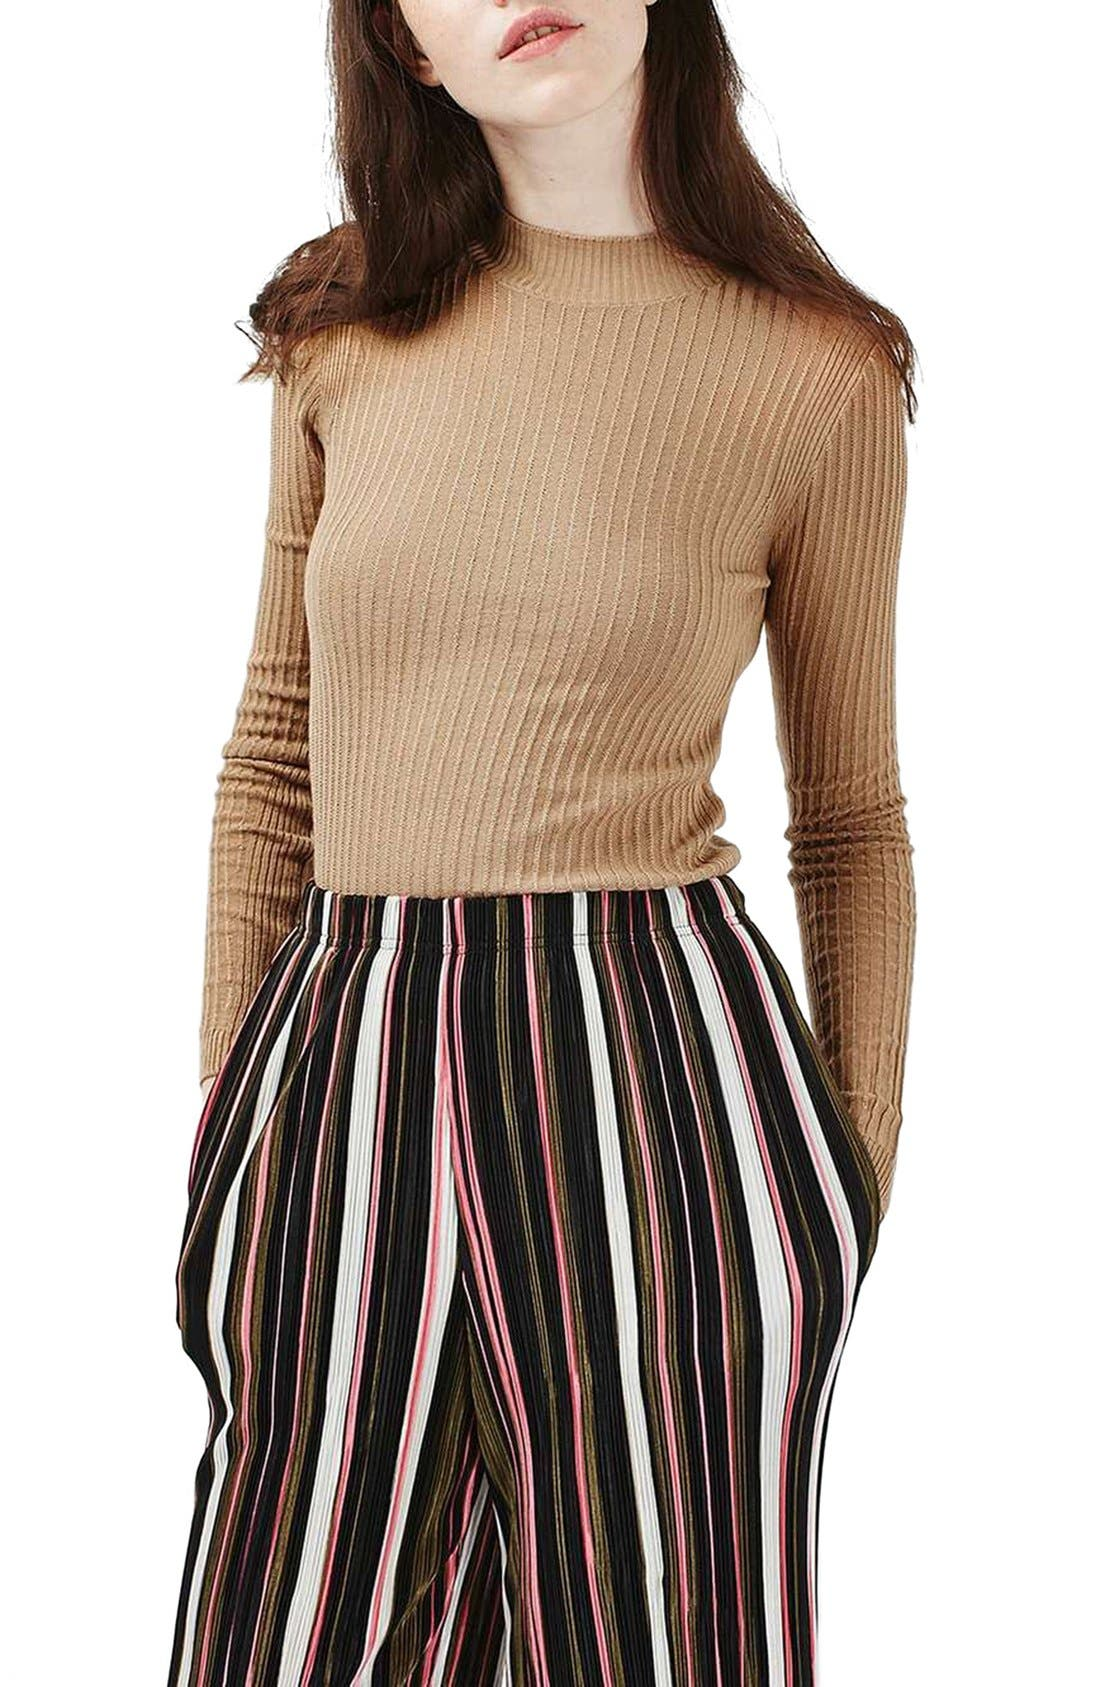 Alternate Image 1 Selected - Topshop Textured Stripe Mock Neck Sweater